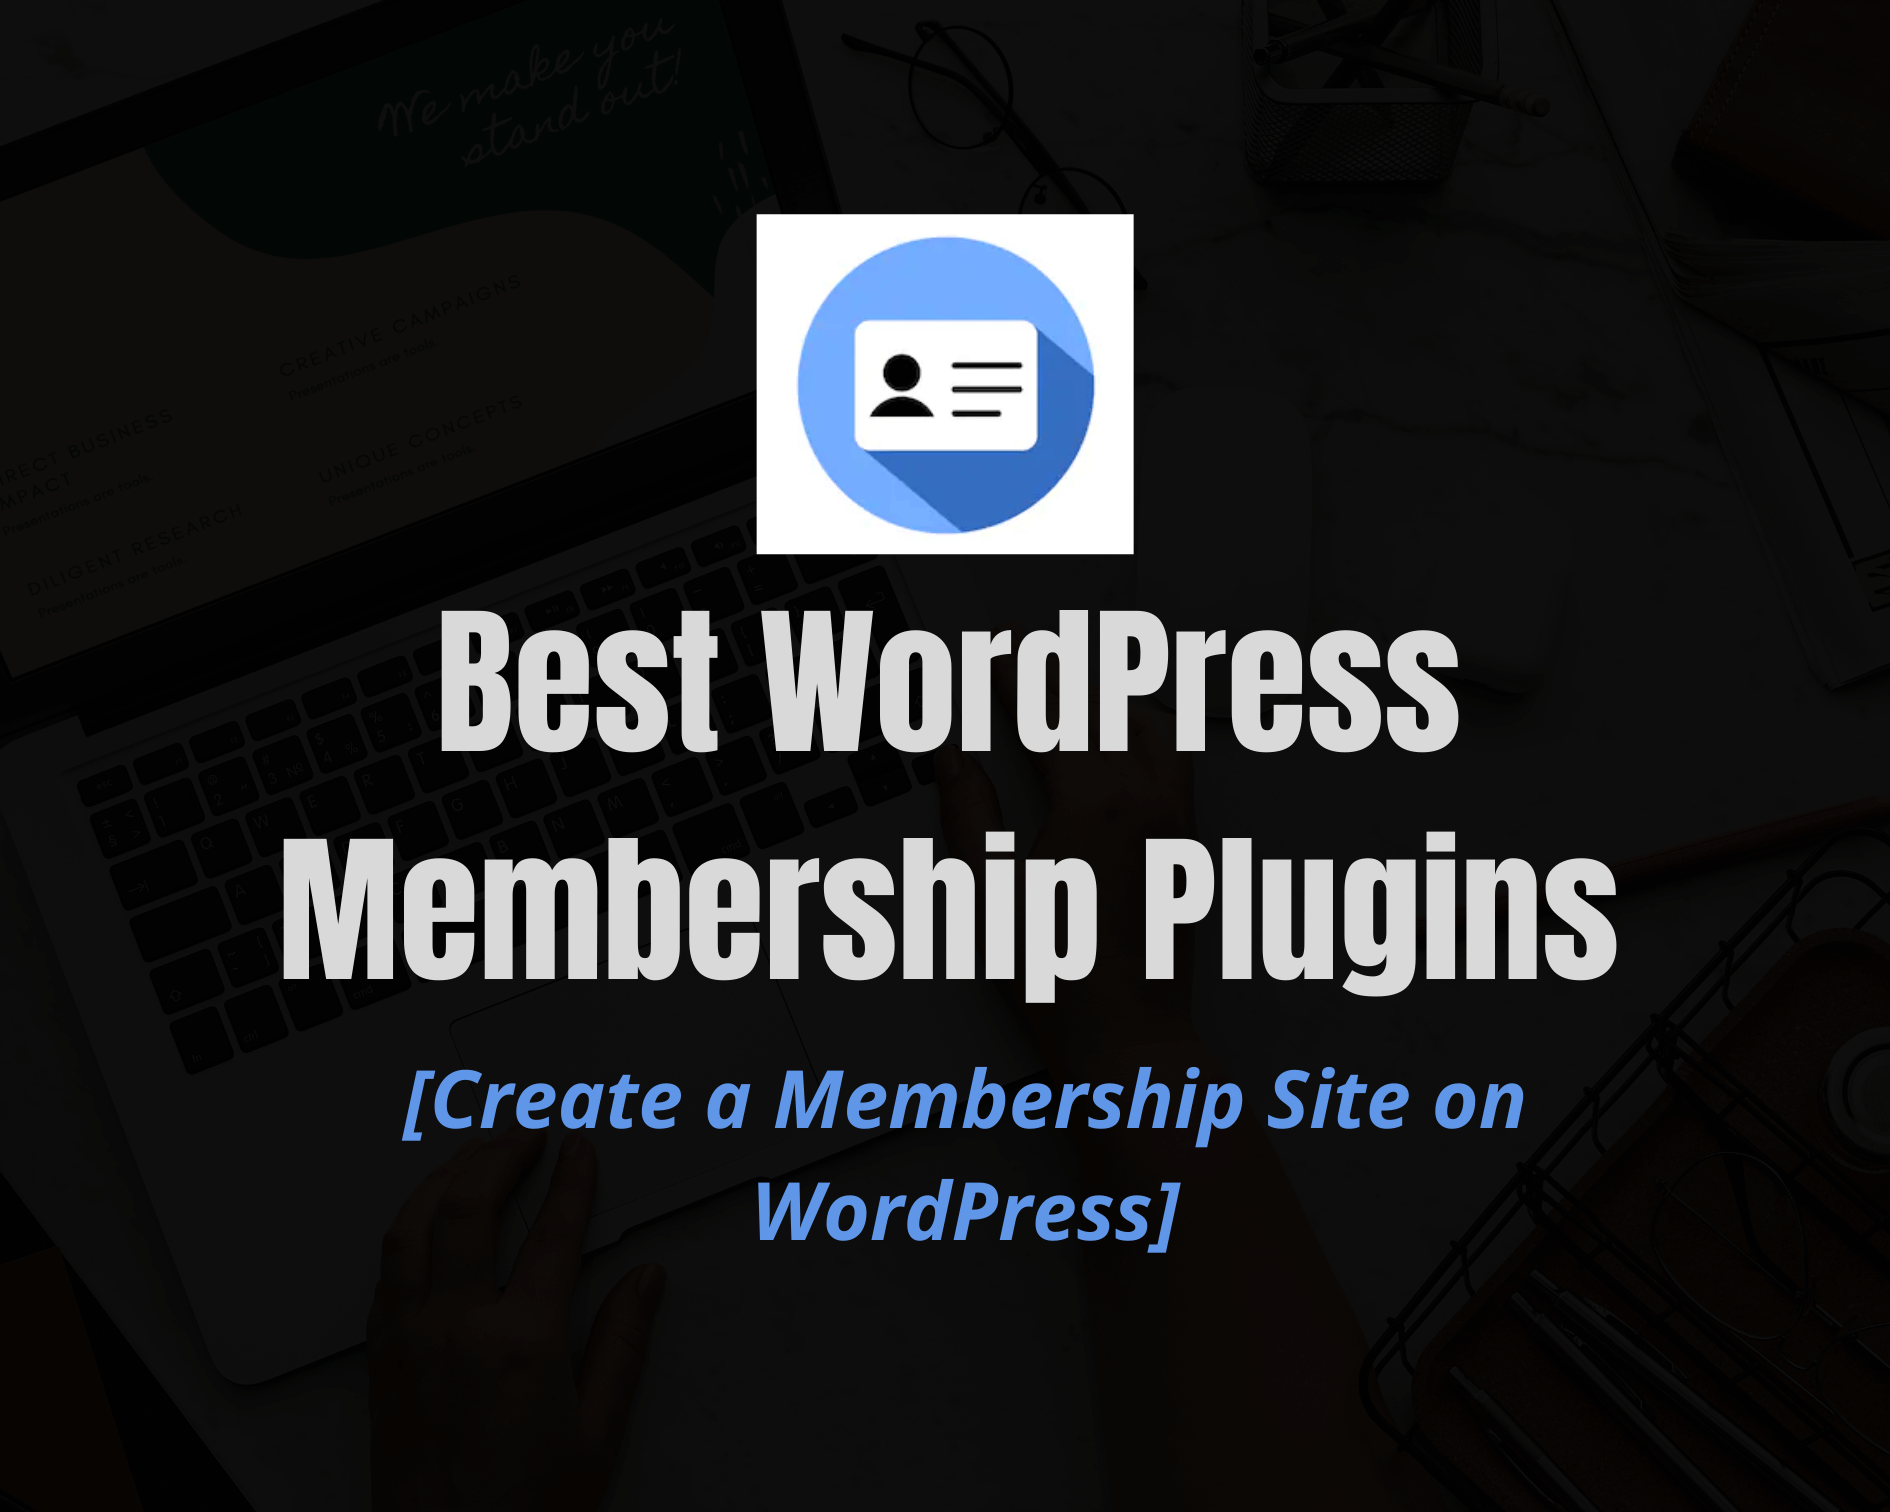 7 Best WordPress Membership Plugins  for 2021